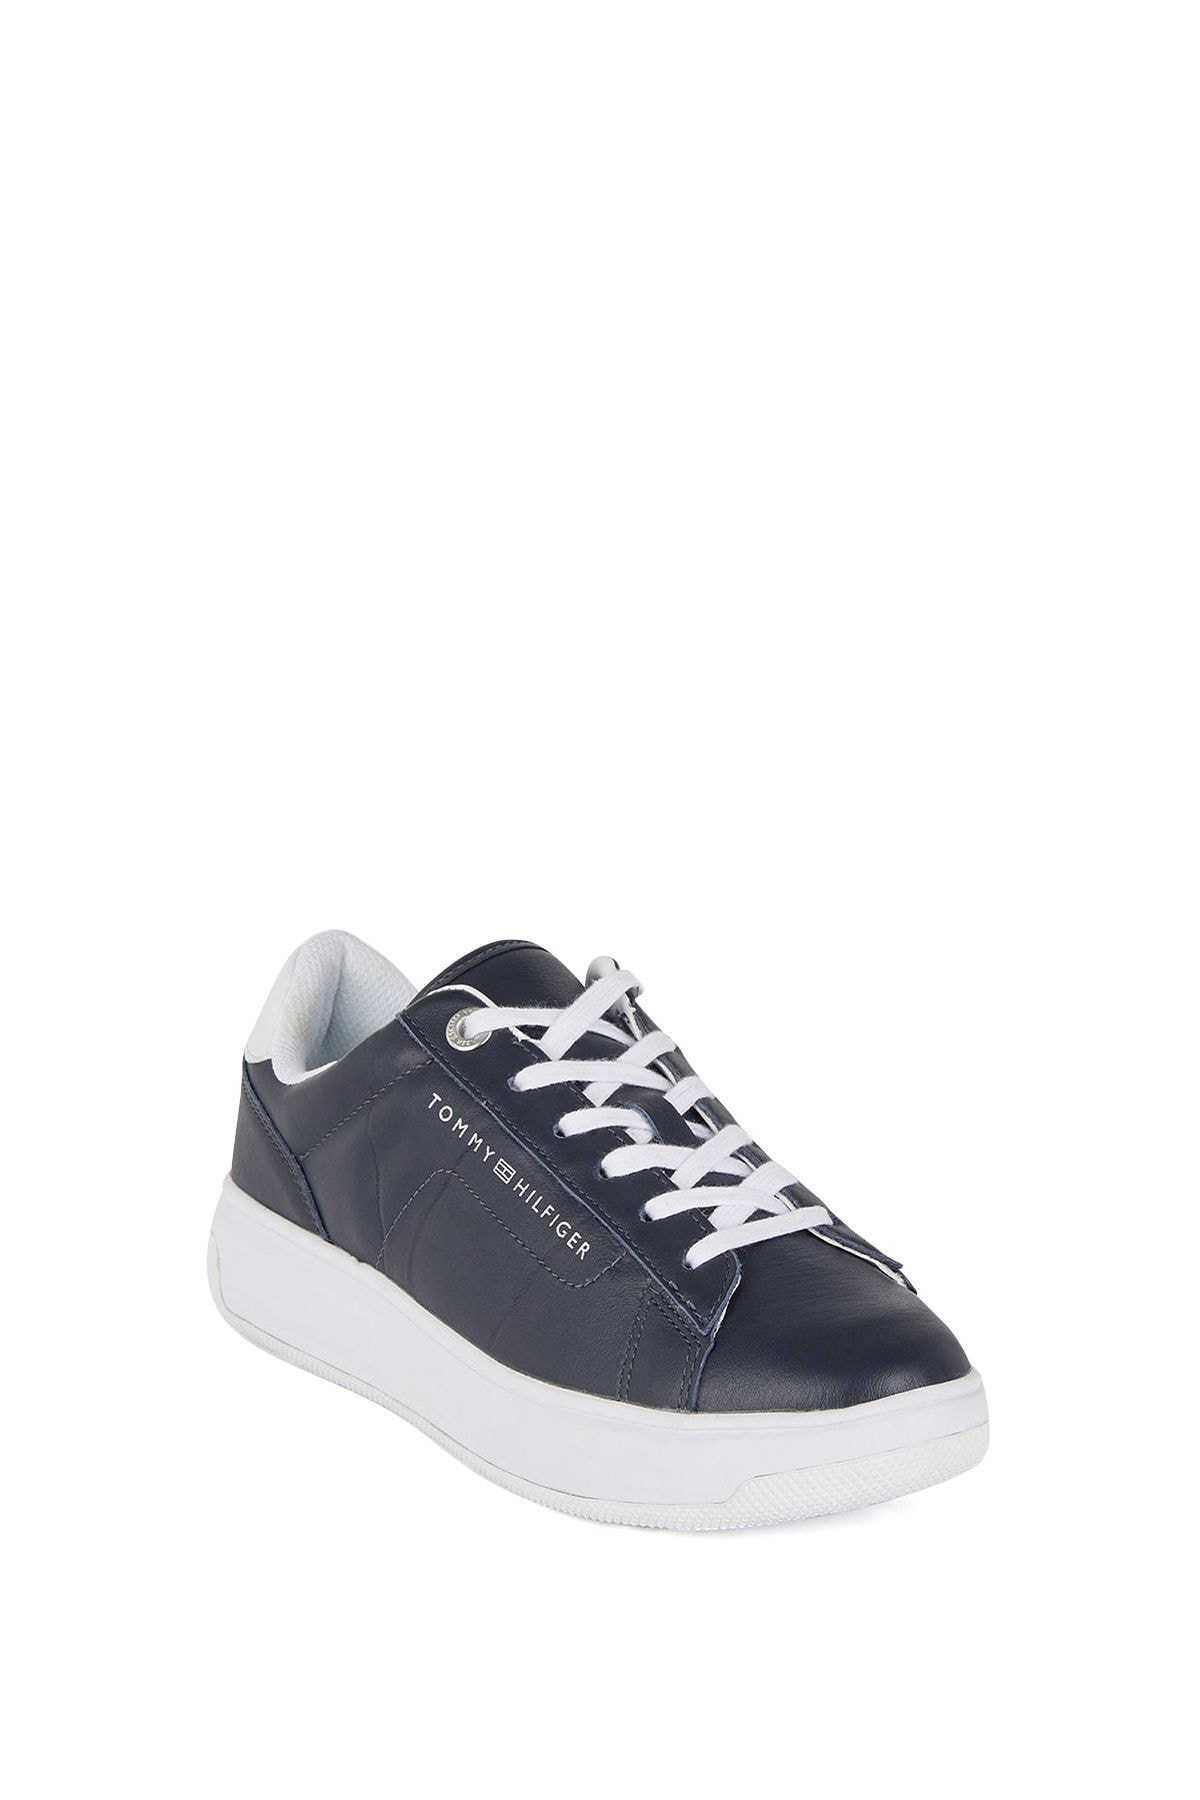 Tommy Hilfiger Kadın Siyah Leather Cupsole Kadın Sneaker 1